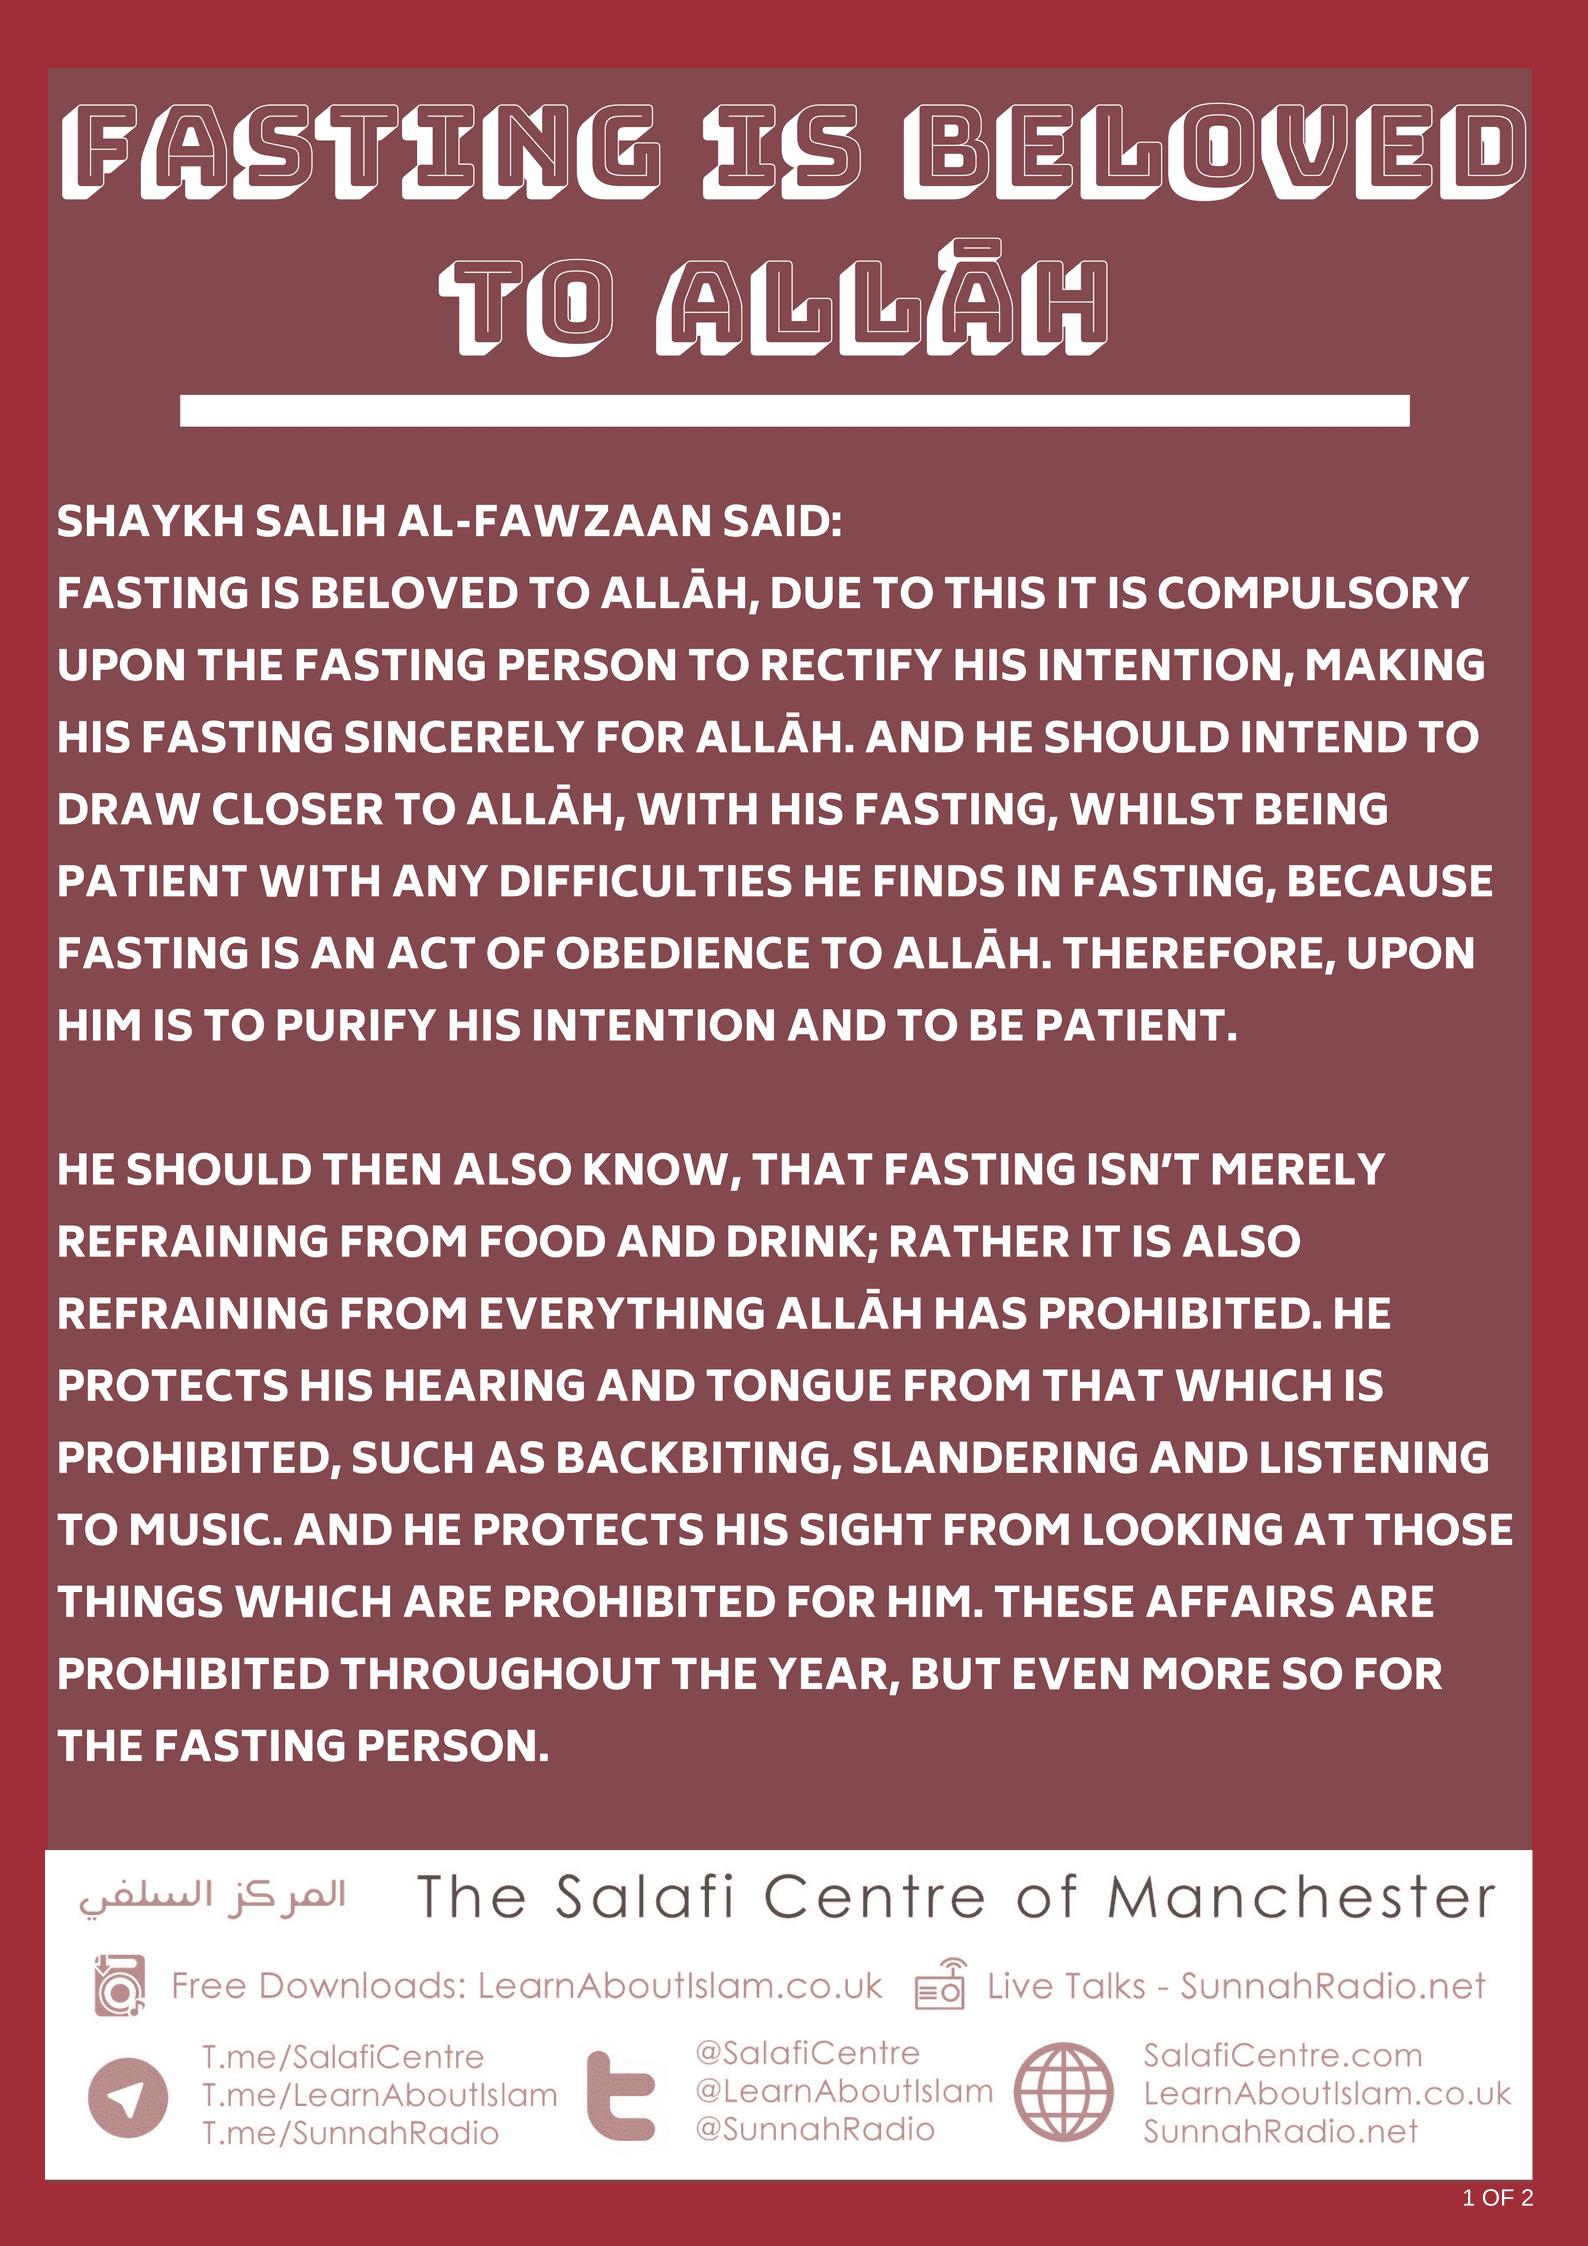 Fasting is Beloved to Allāh – Shaykh Fawzān